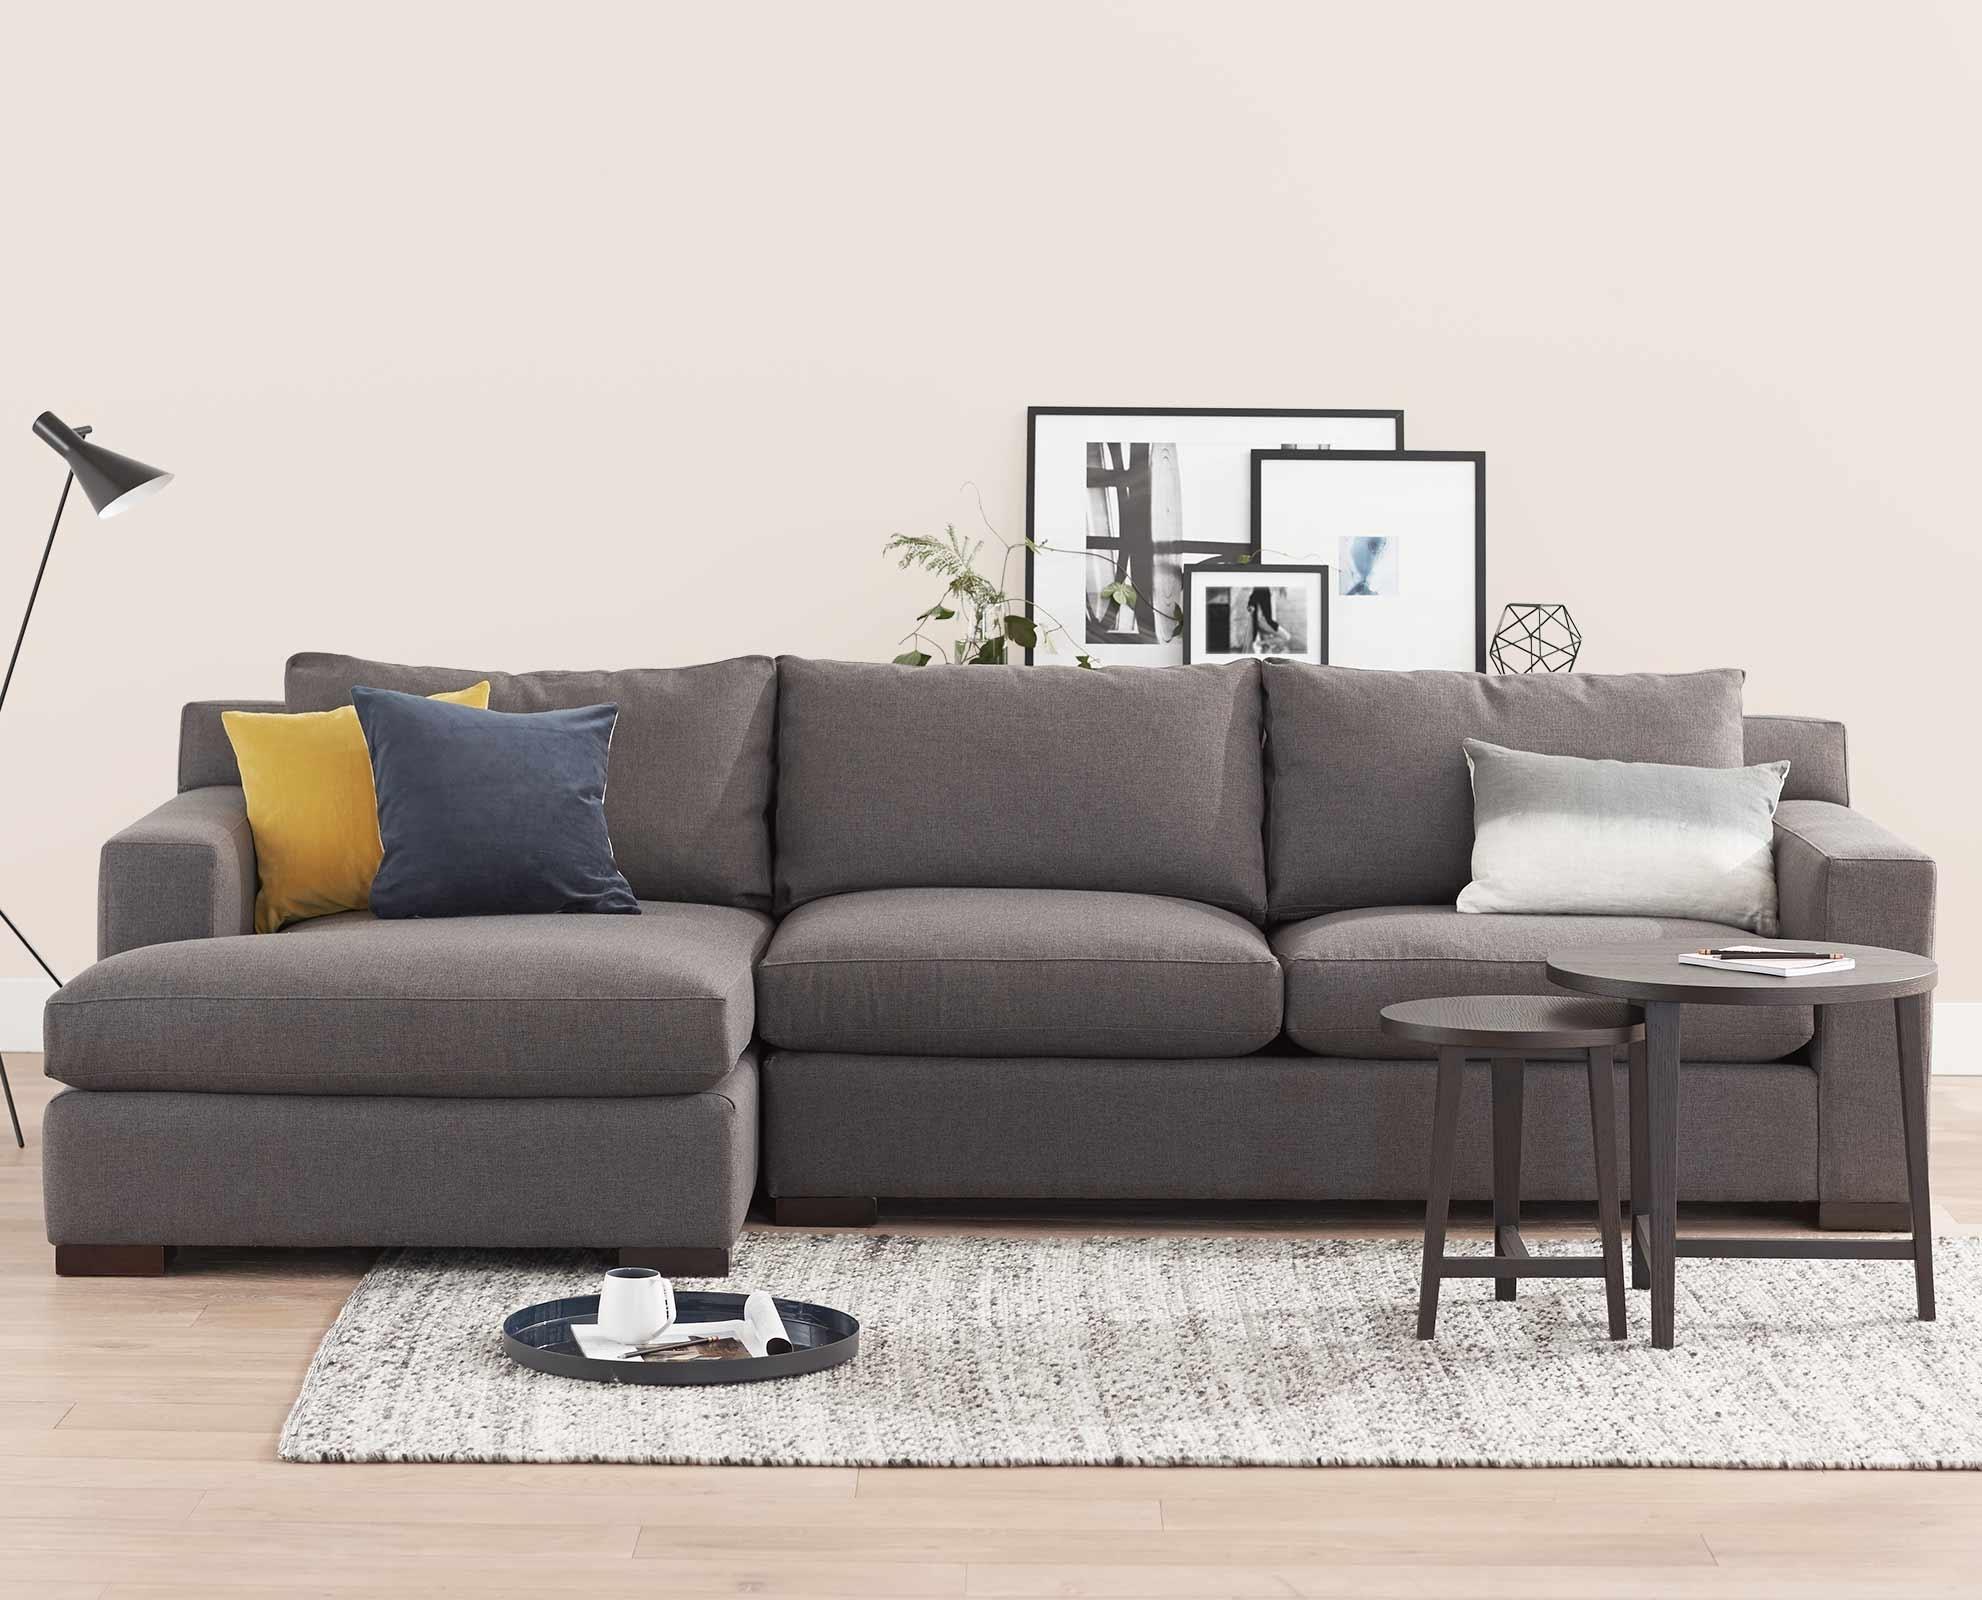 Furniture: Wonderful Selection Of Qualitydaniafurniture Pertaining To Dania Sectional Sofas (Image 4 of 10)